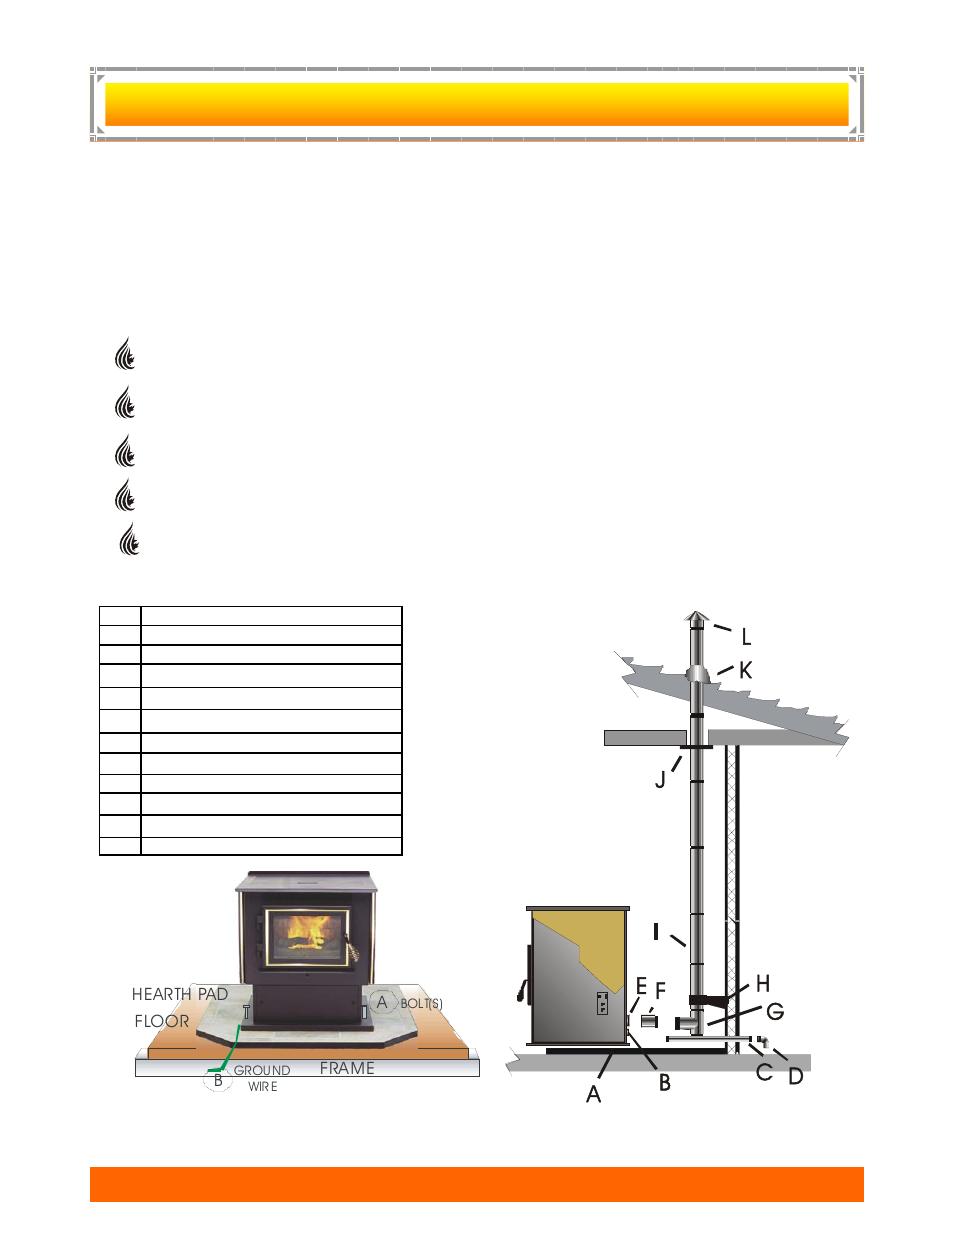 Obile, Nstallation | PelPro Wood Pellet Stoves HSPP2 User Manual ...